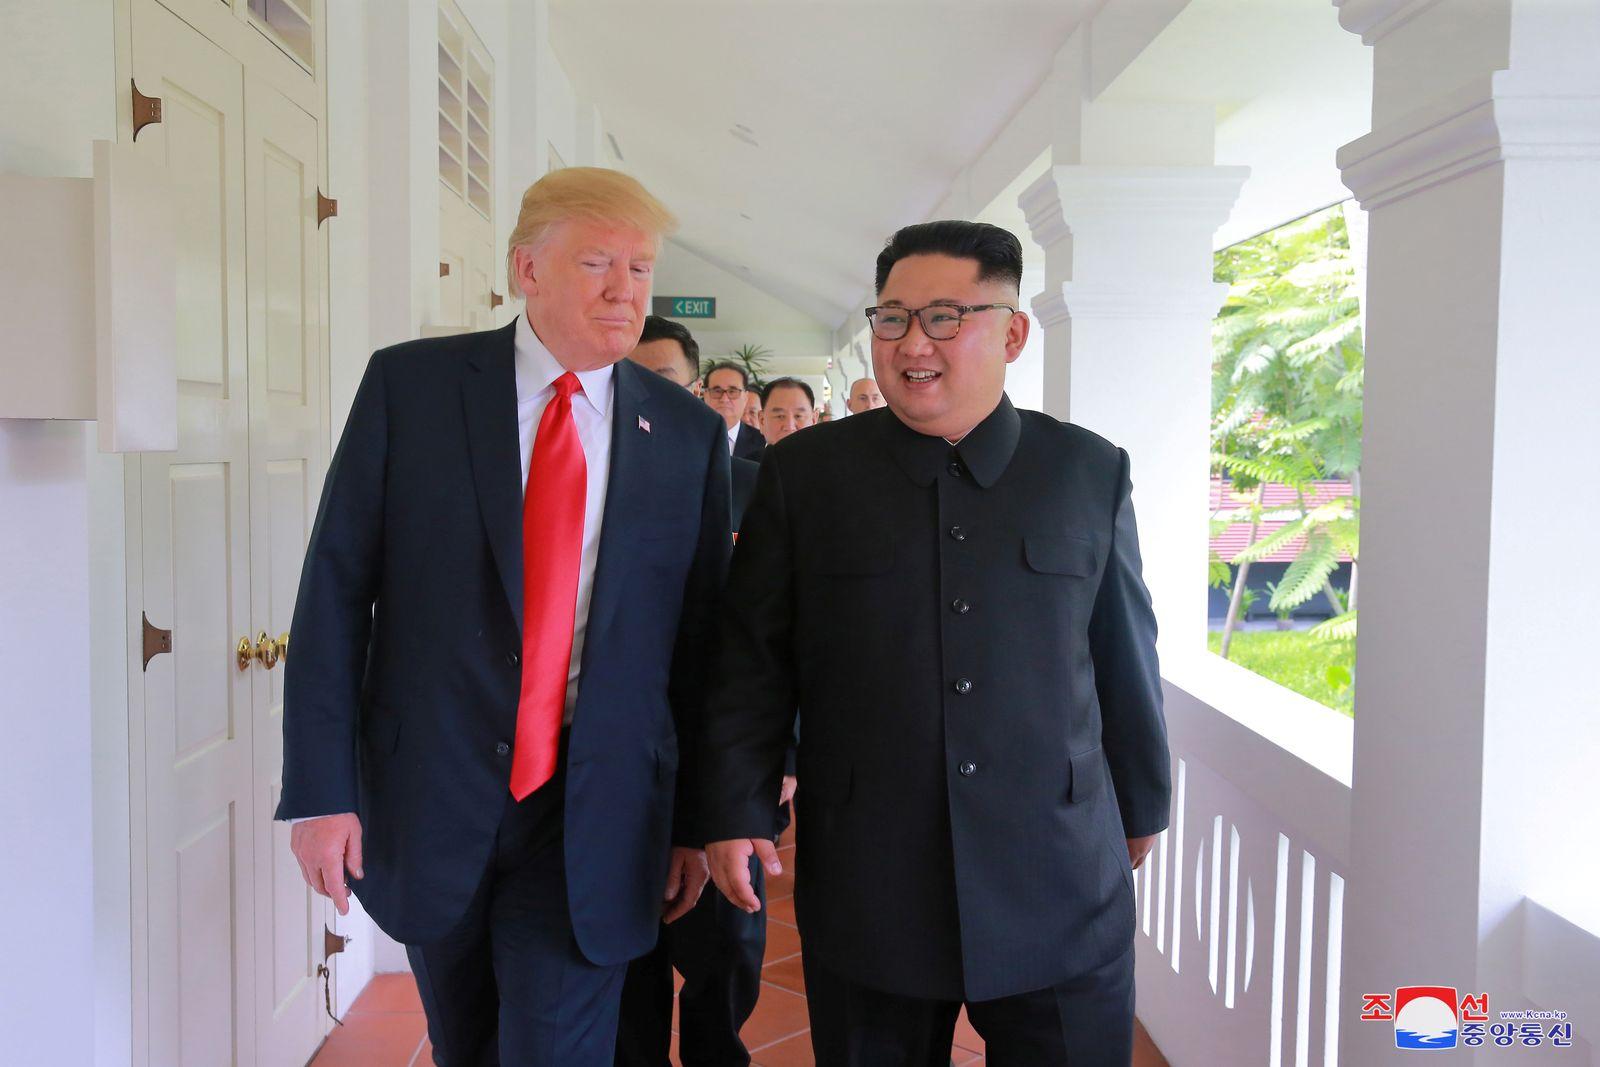 Kim Jong Un/ Donald Trump